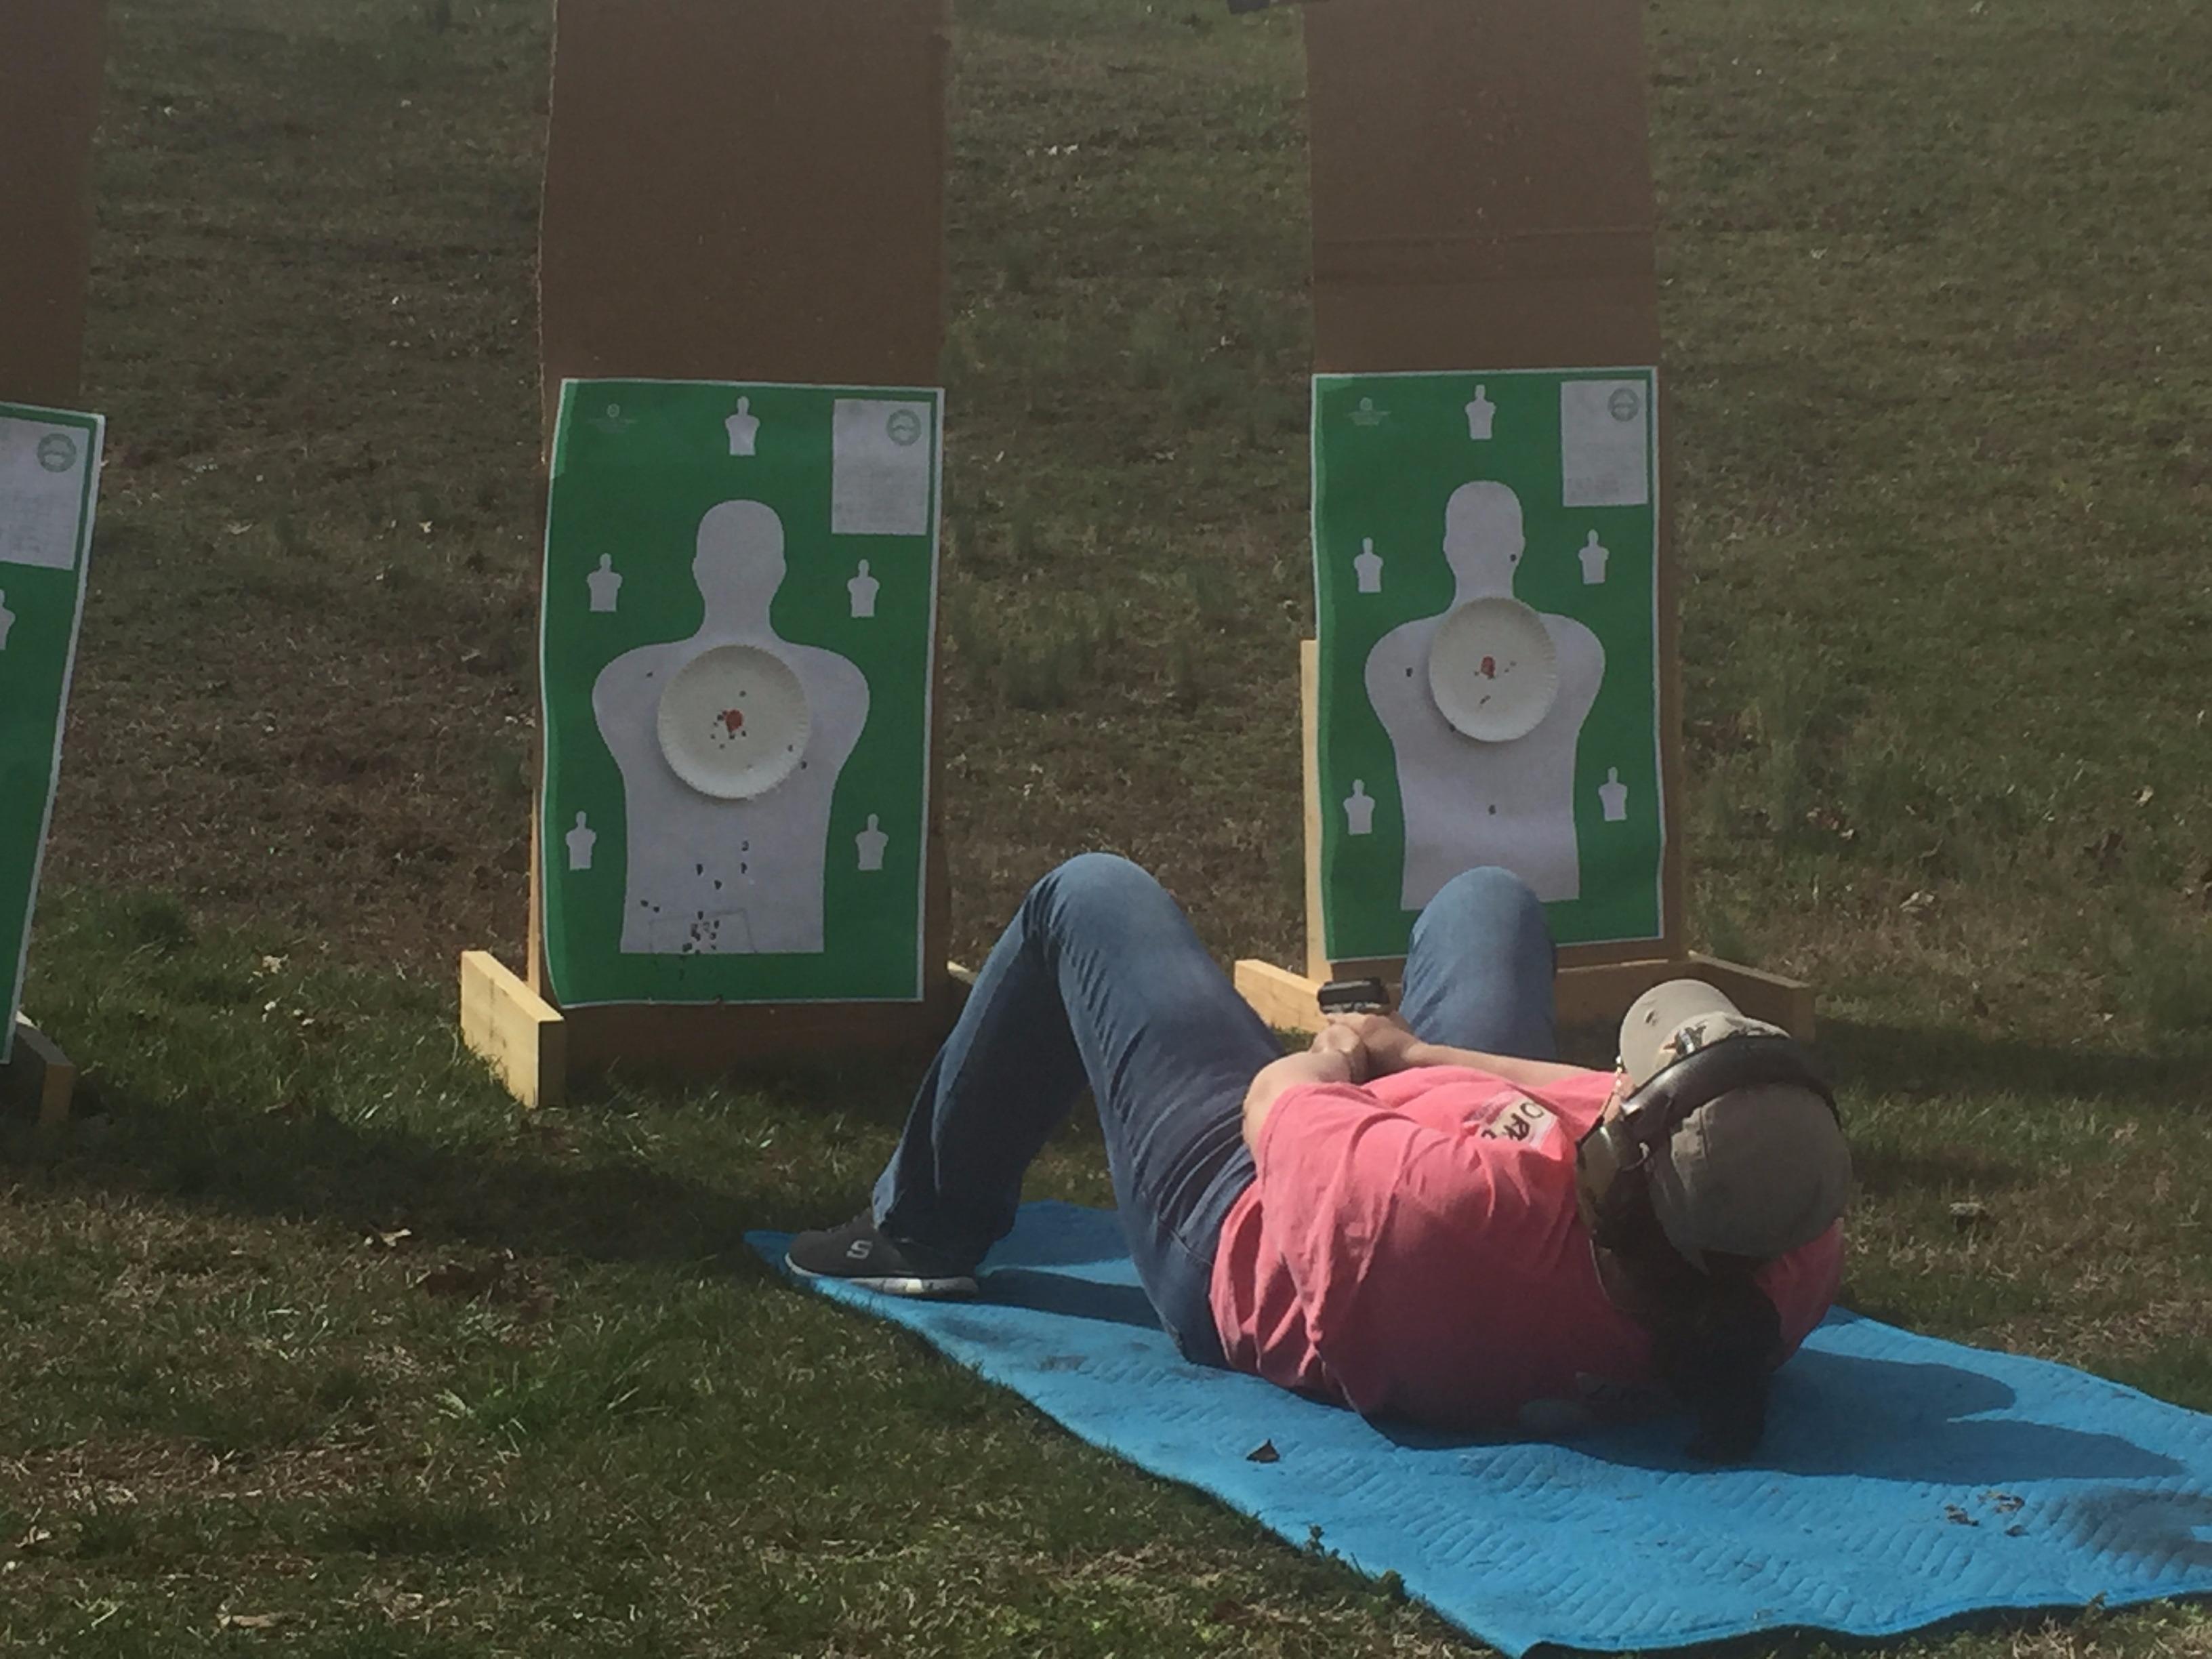 Georgia Firearms And Security Training Academy (GAFASTA) image 4